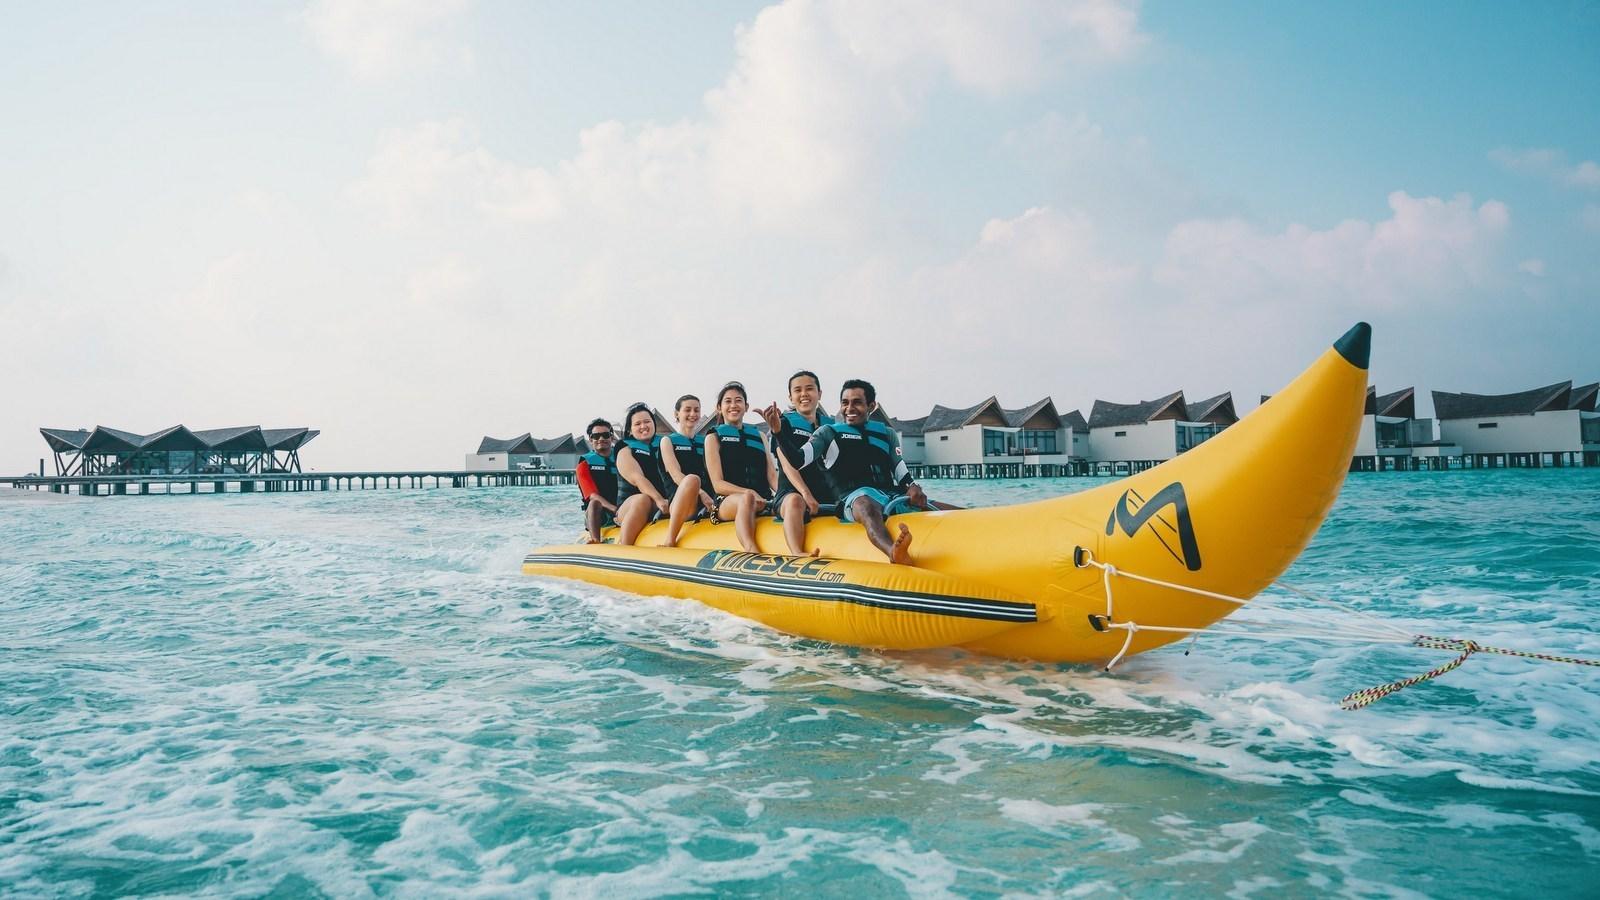 Мальдивы, отель Movenpick Resort Kuredhivaru Maldives, банана